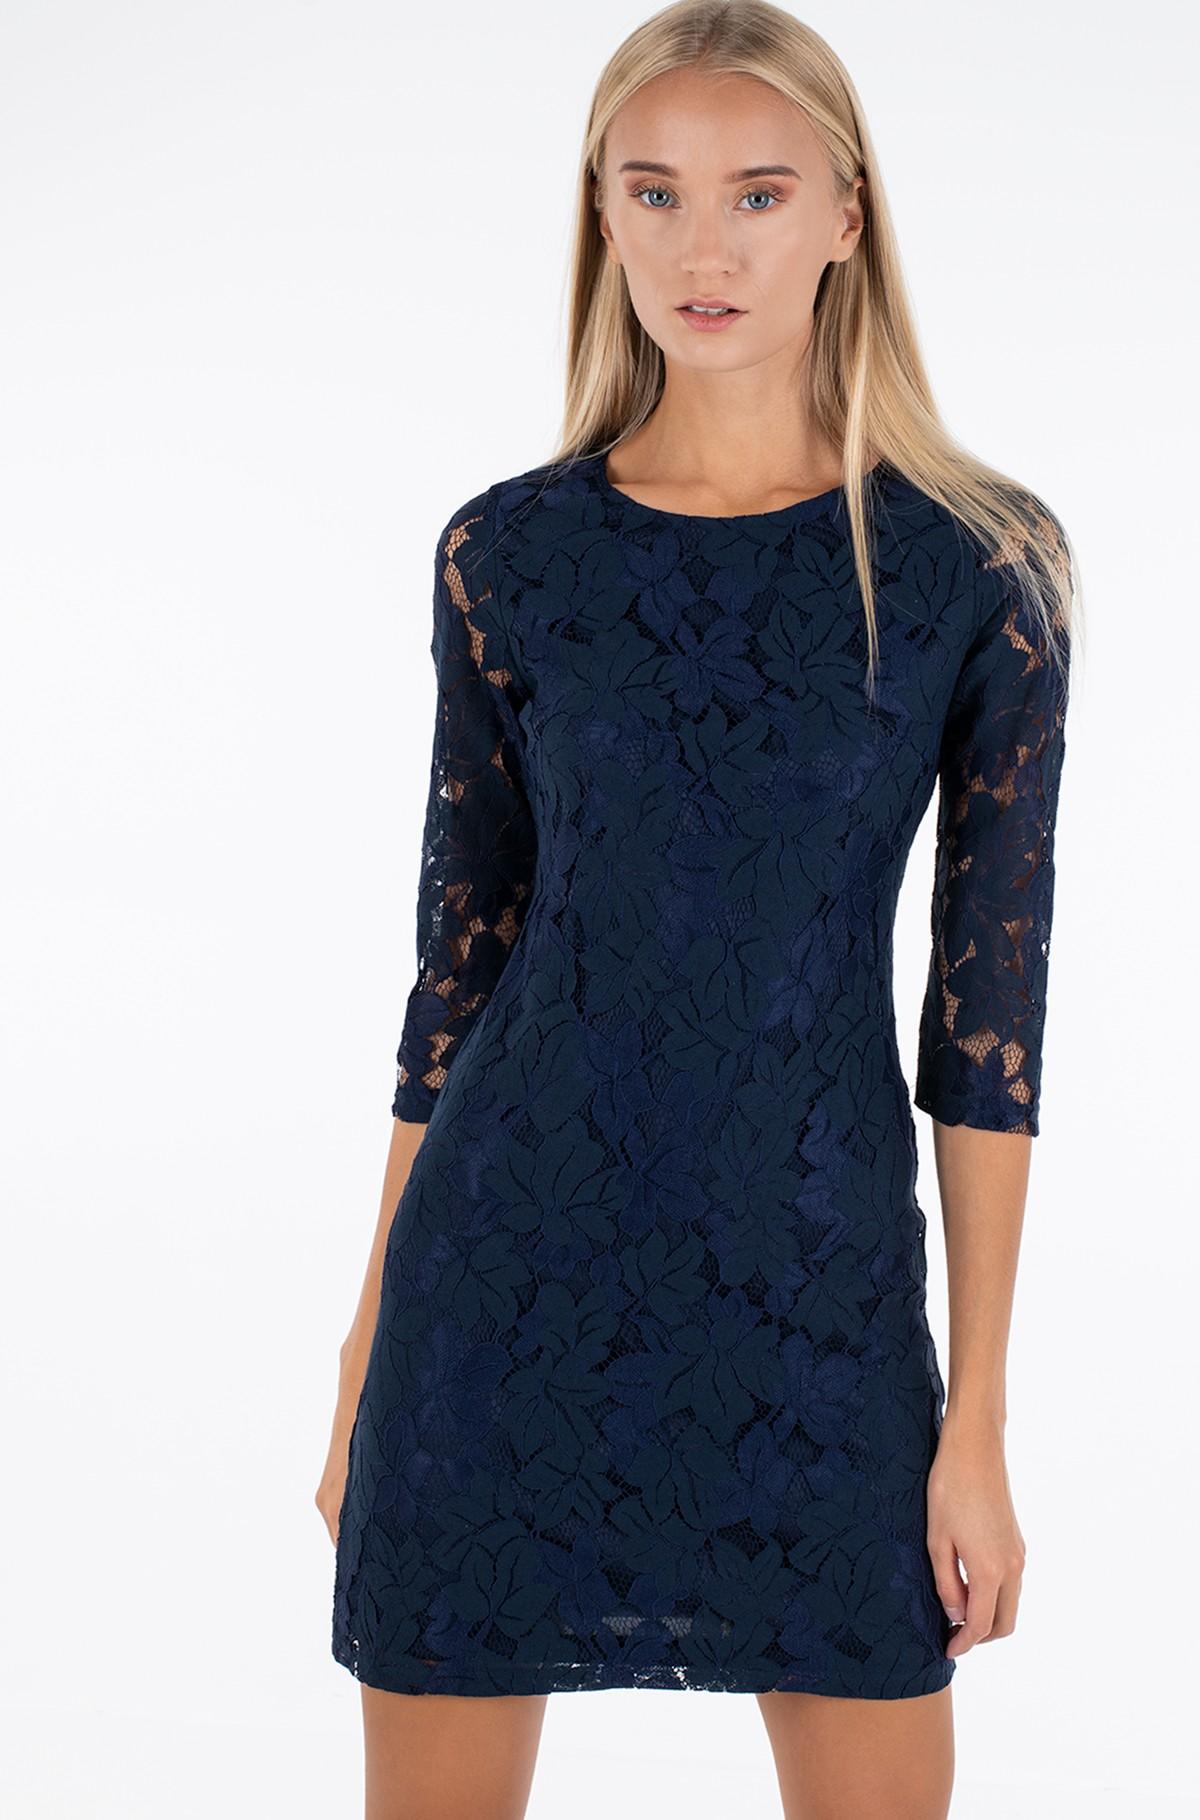 Lace dress N171H20-full-1